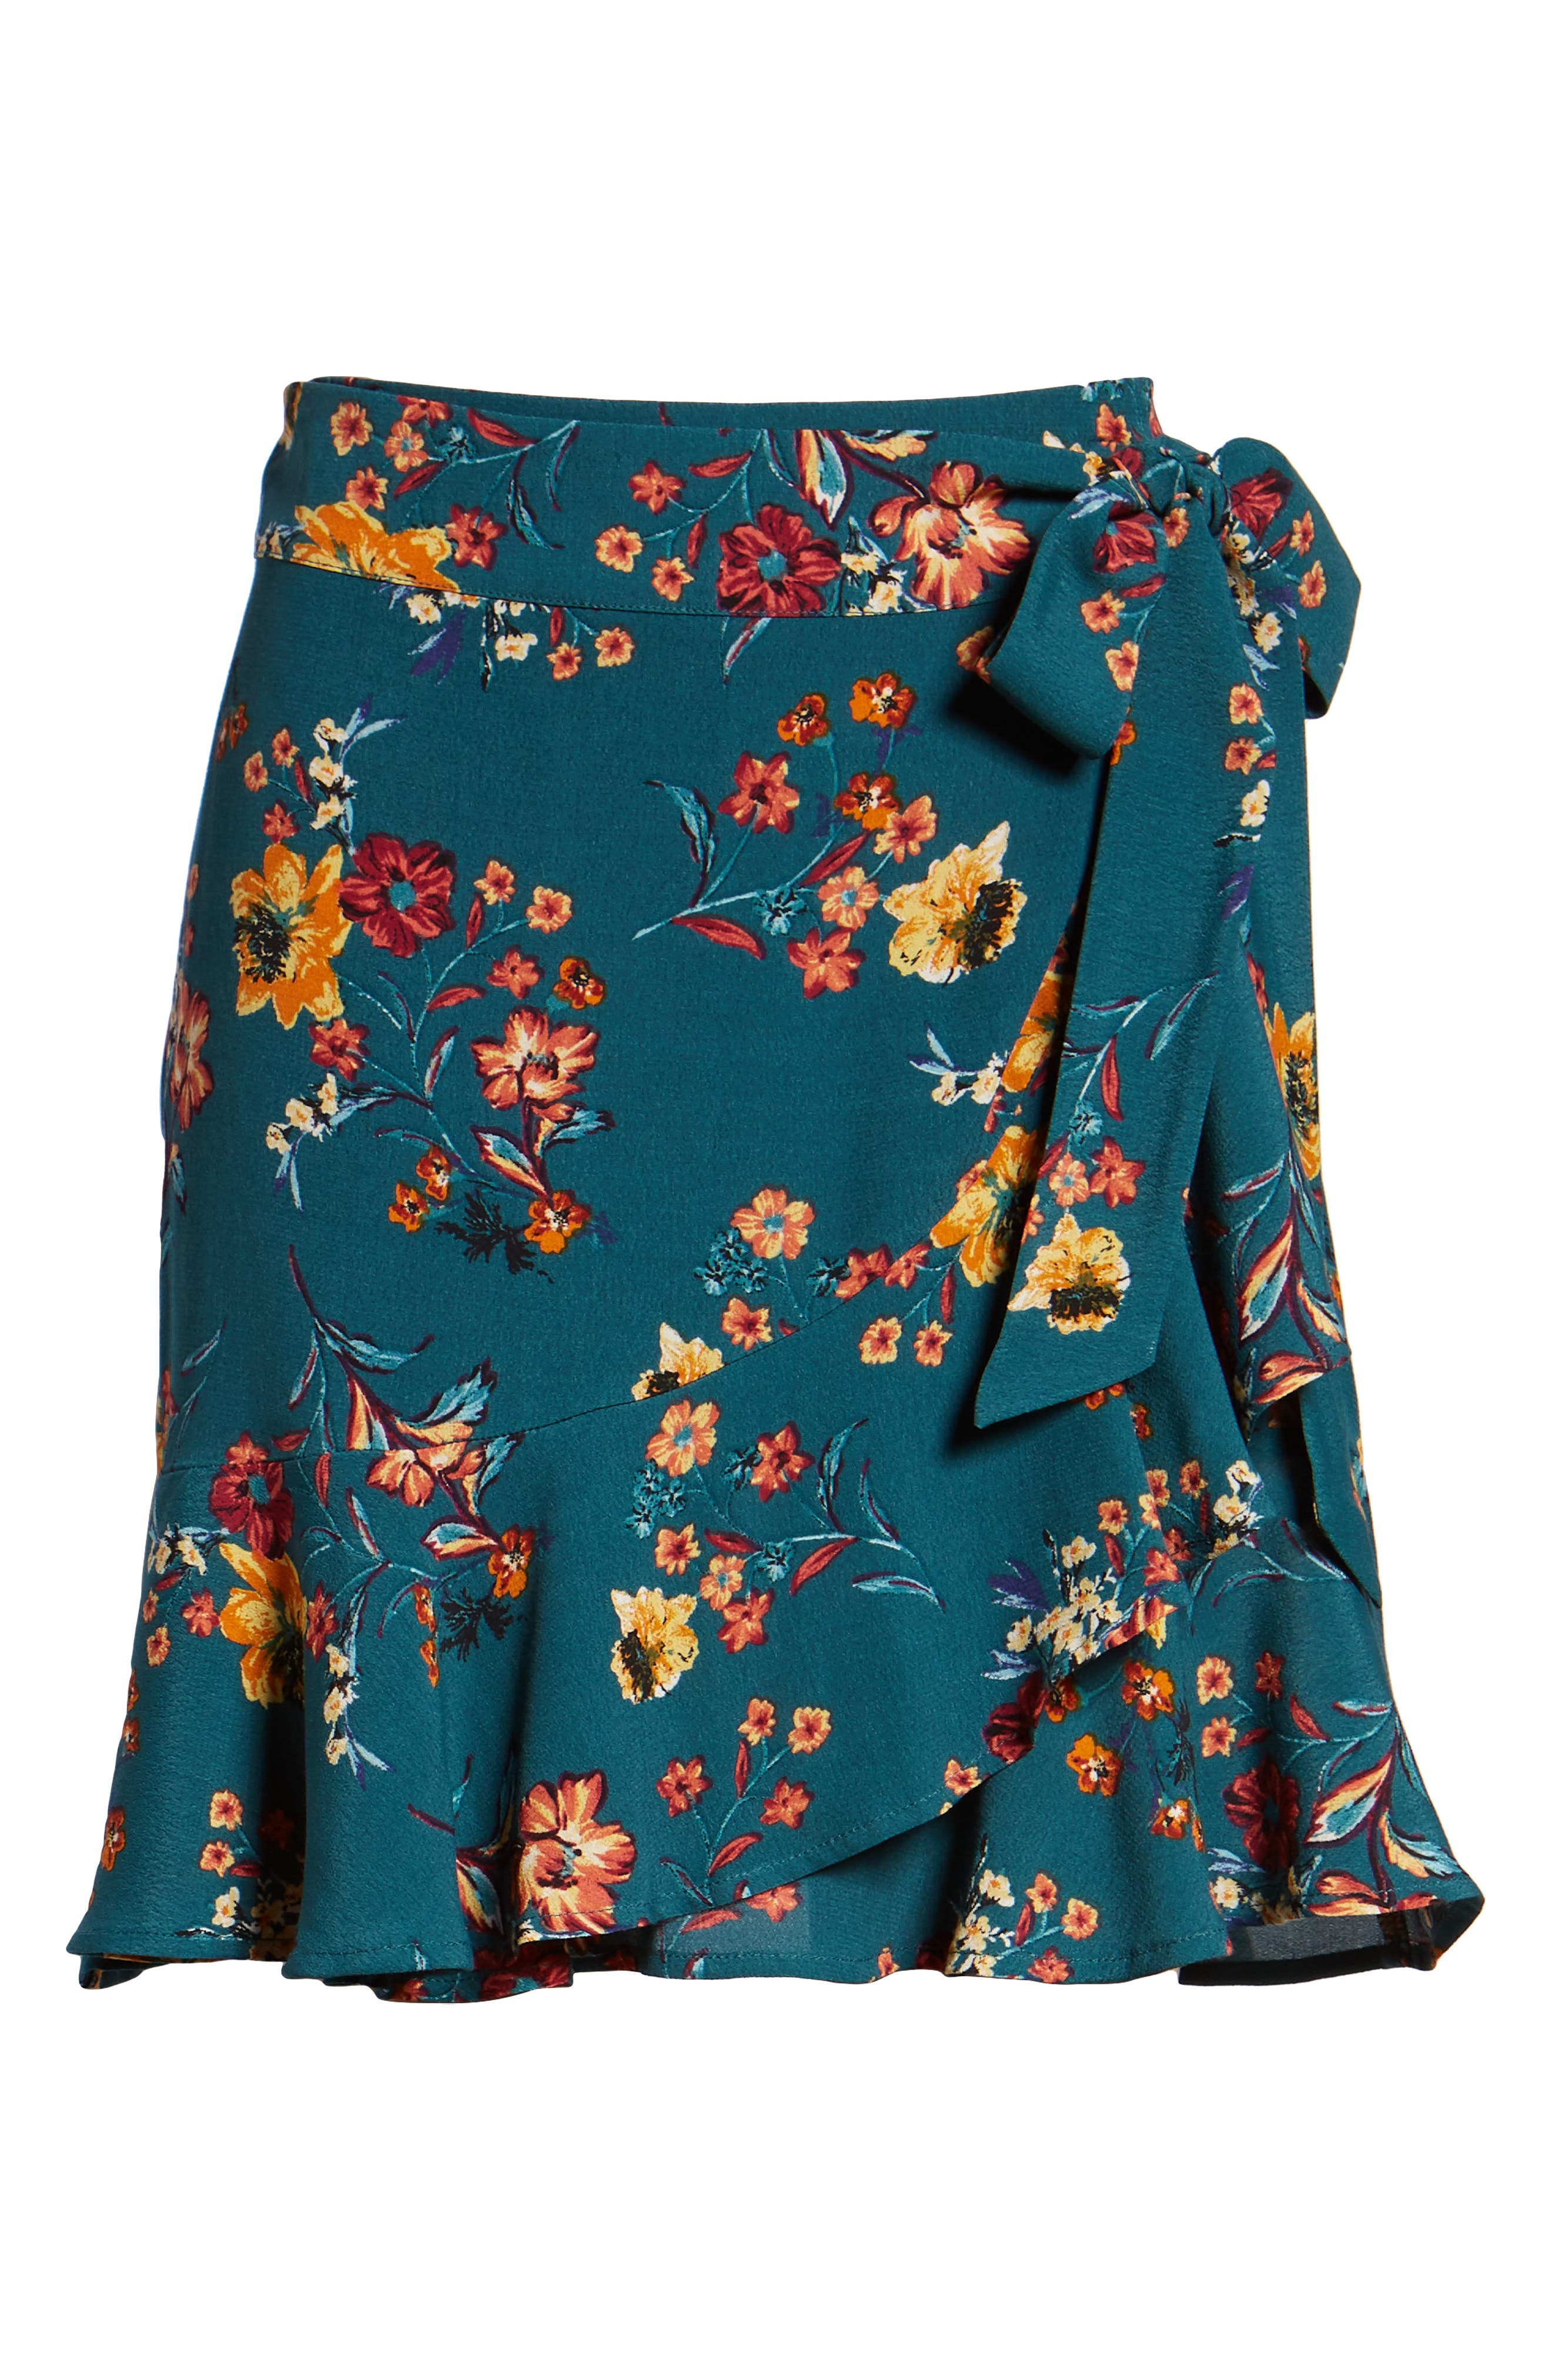 Aviana Ruffle Wrap Skirt,                             Alternate thumbnail 6, color,                             348